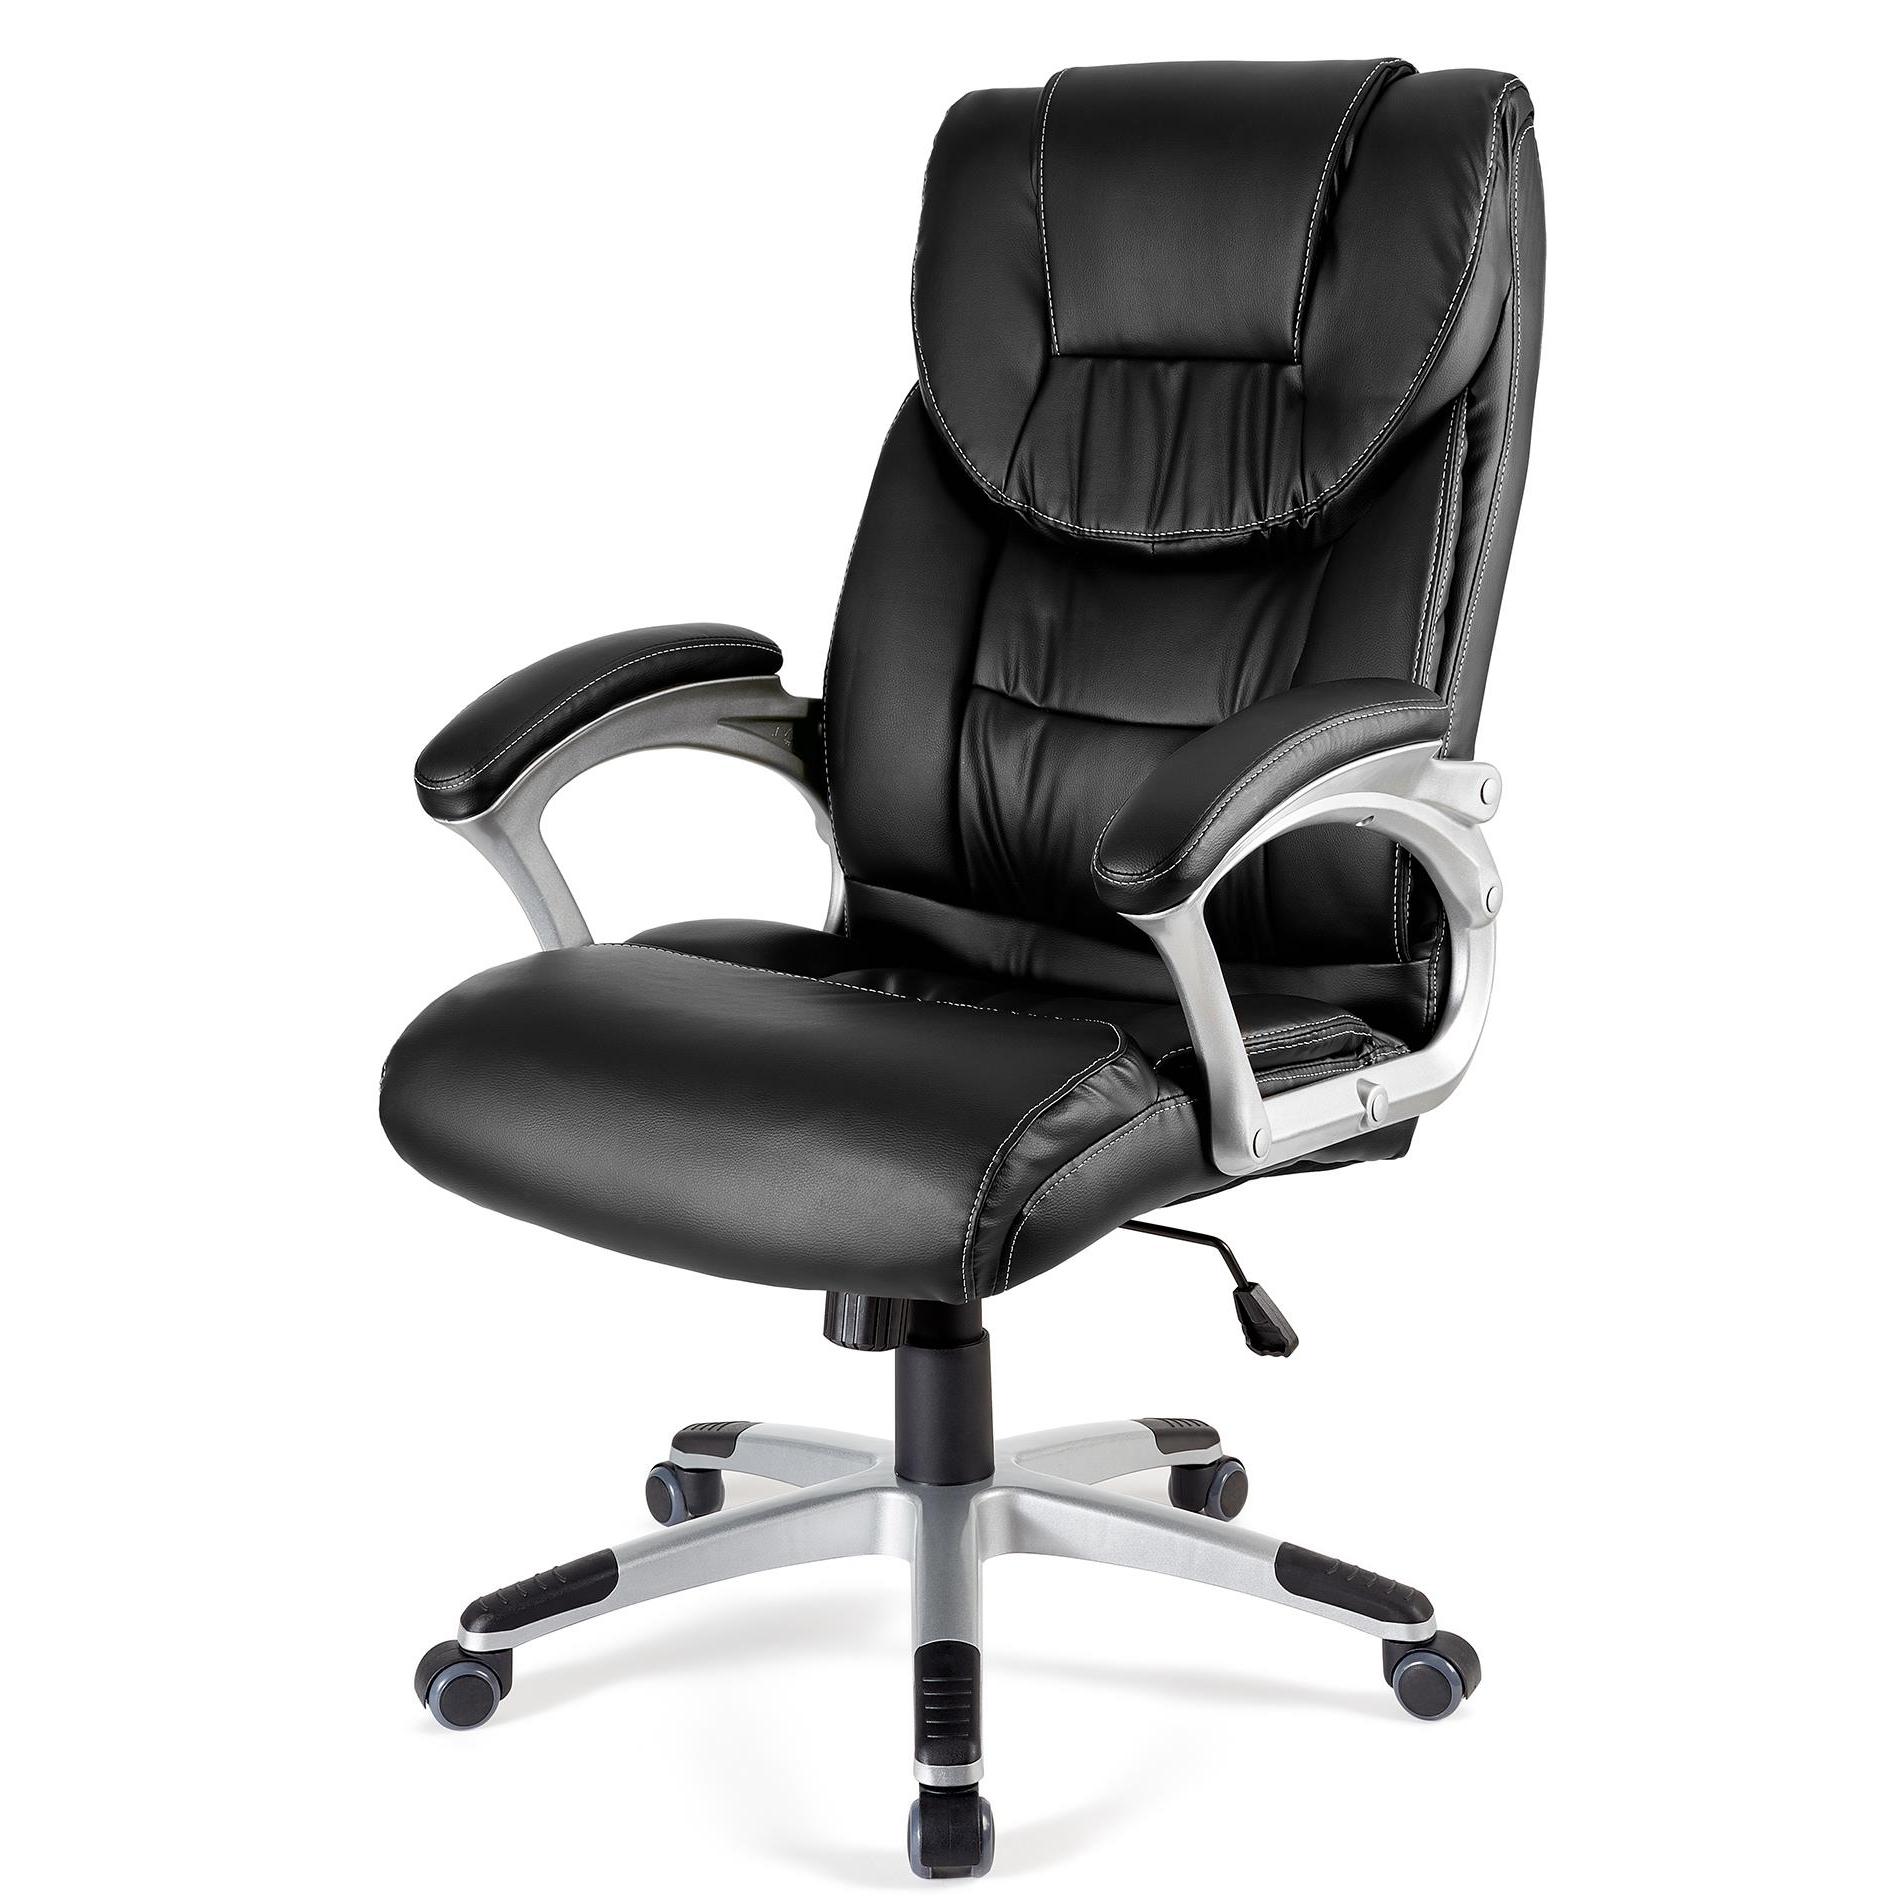 Sillones De Oficina 9ddf Sillà N De Oficina Baltimore En Piel Color Negro Sillà N De Oficina